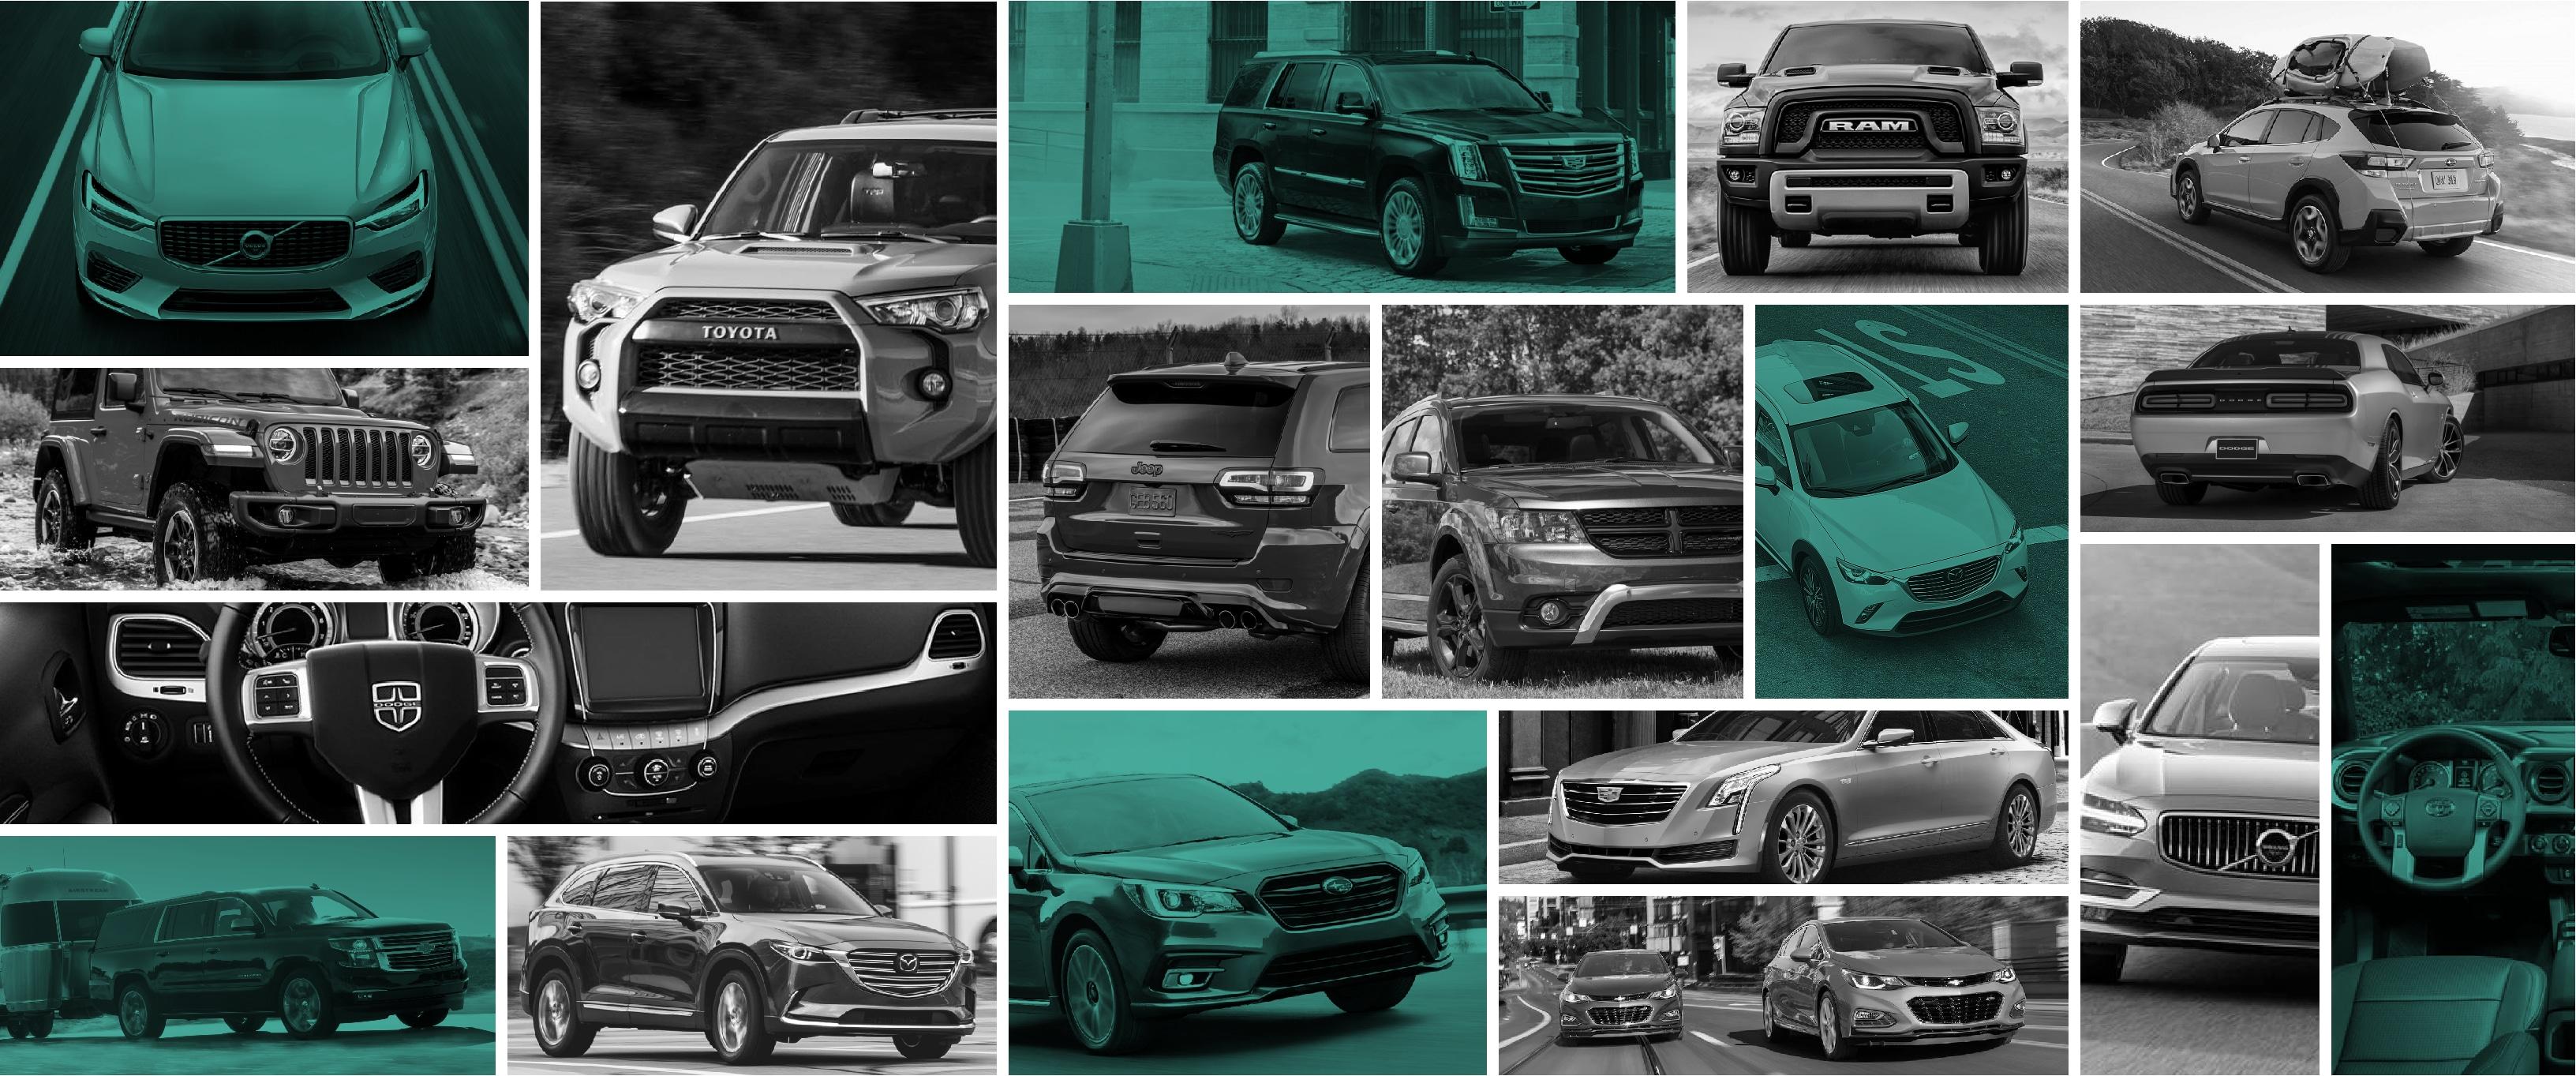 sam kia in turbo automax best llc listing forte ks dealership next previous wichita